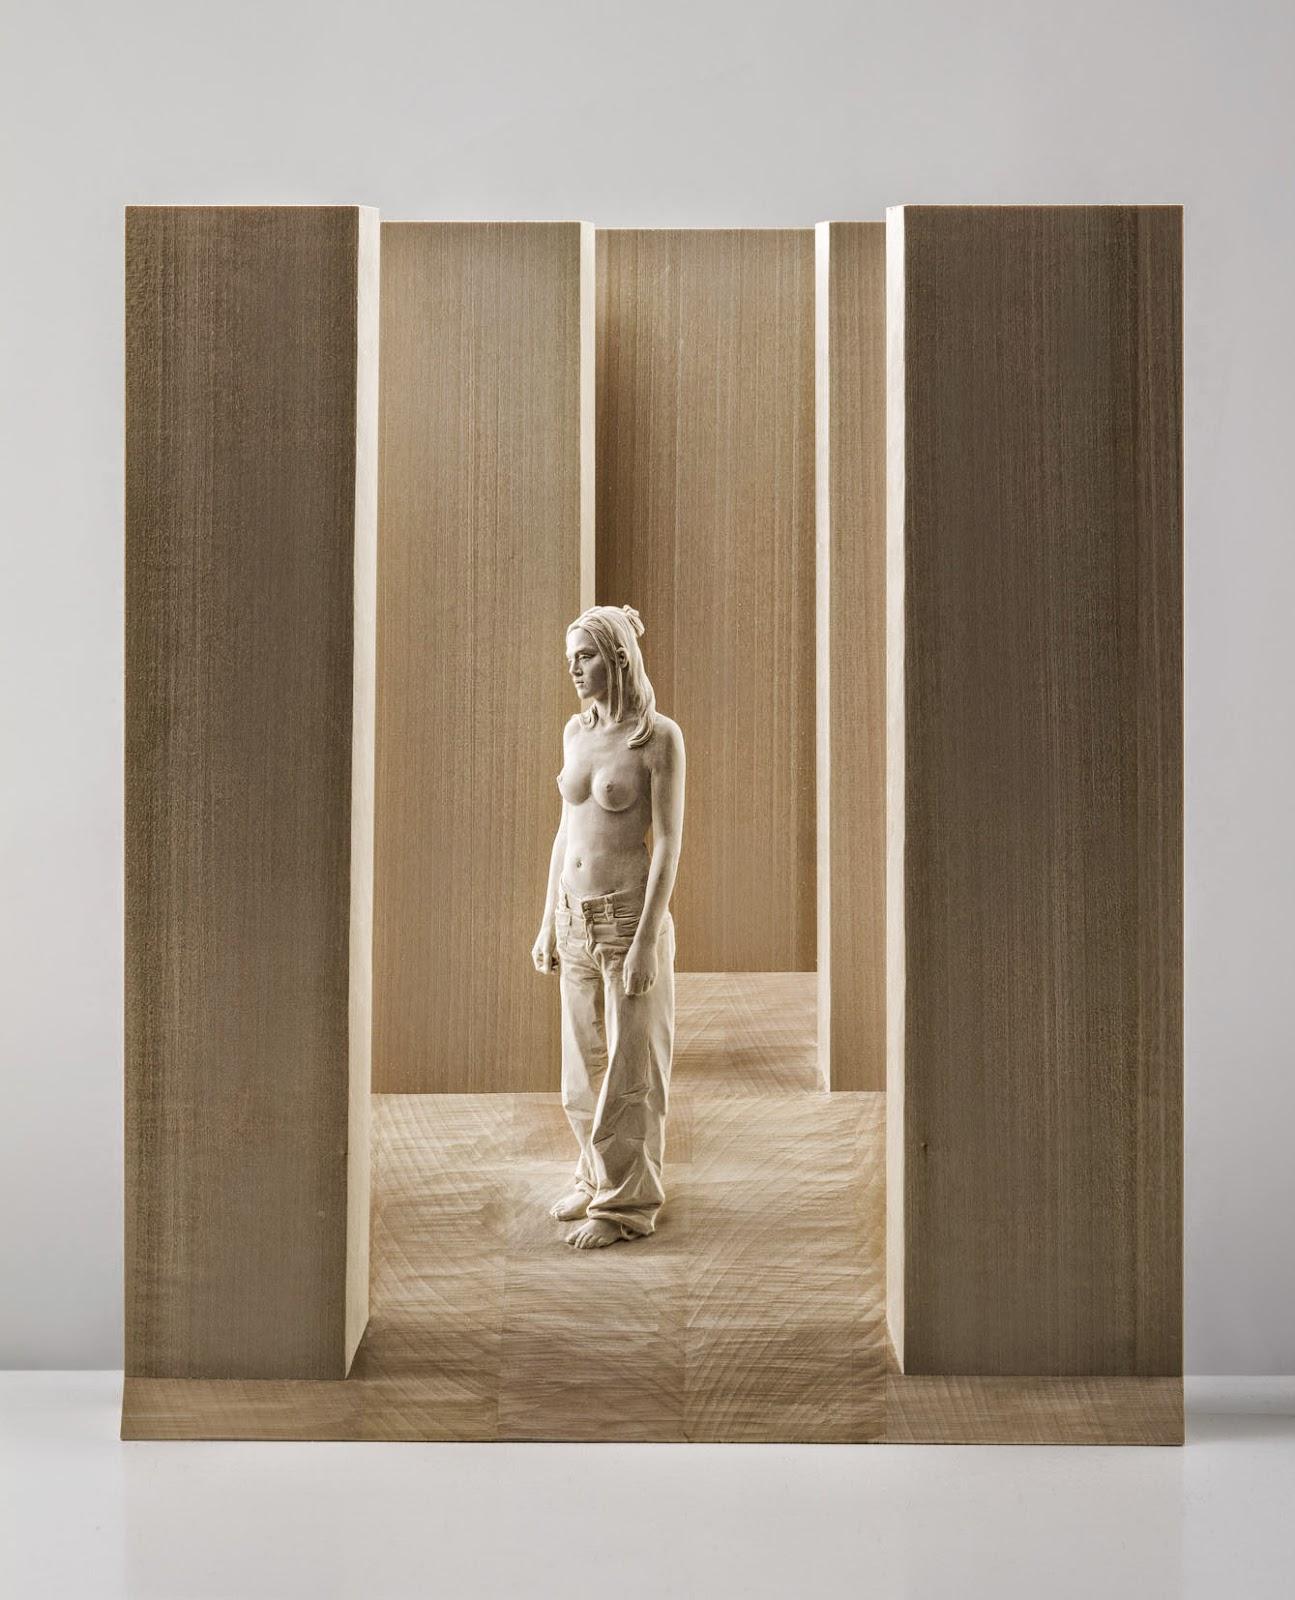 Wood Sculptures by Peter Demetz 24